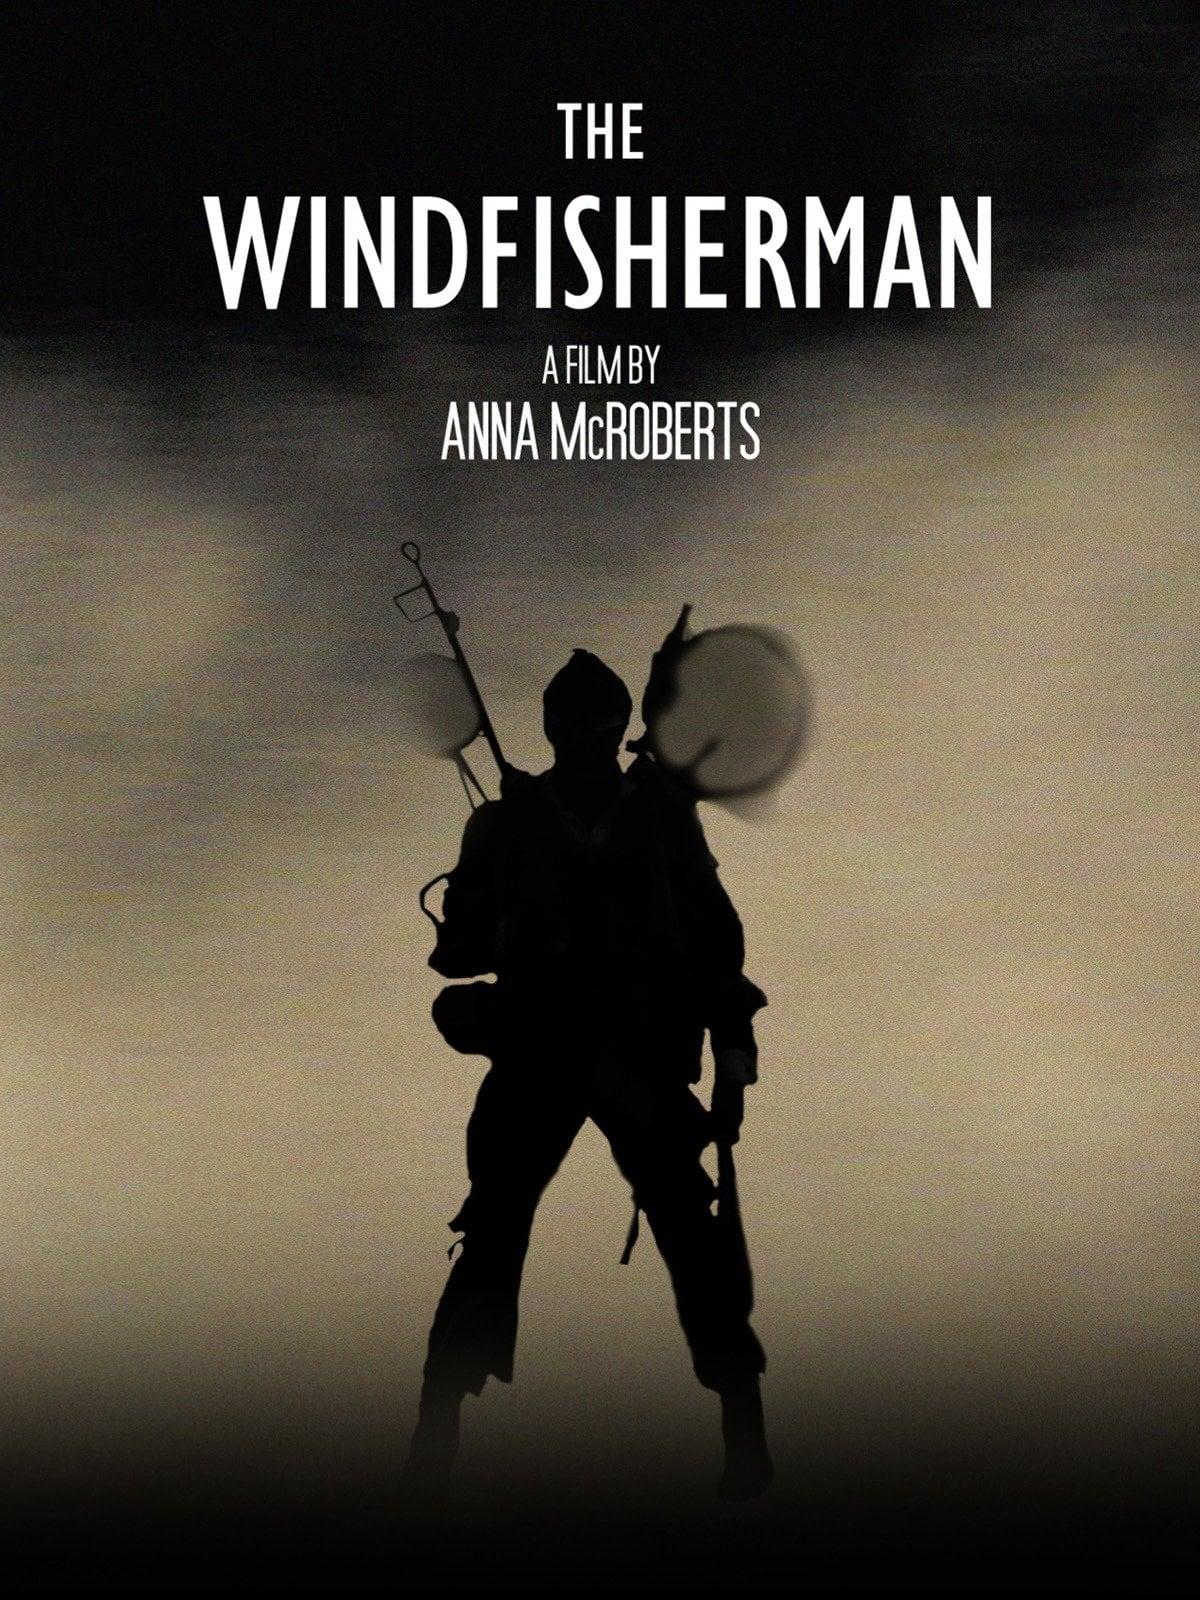 The Wind Fisherman